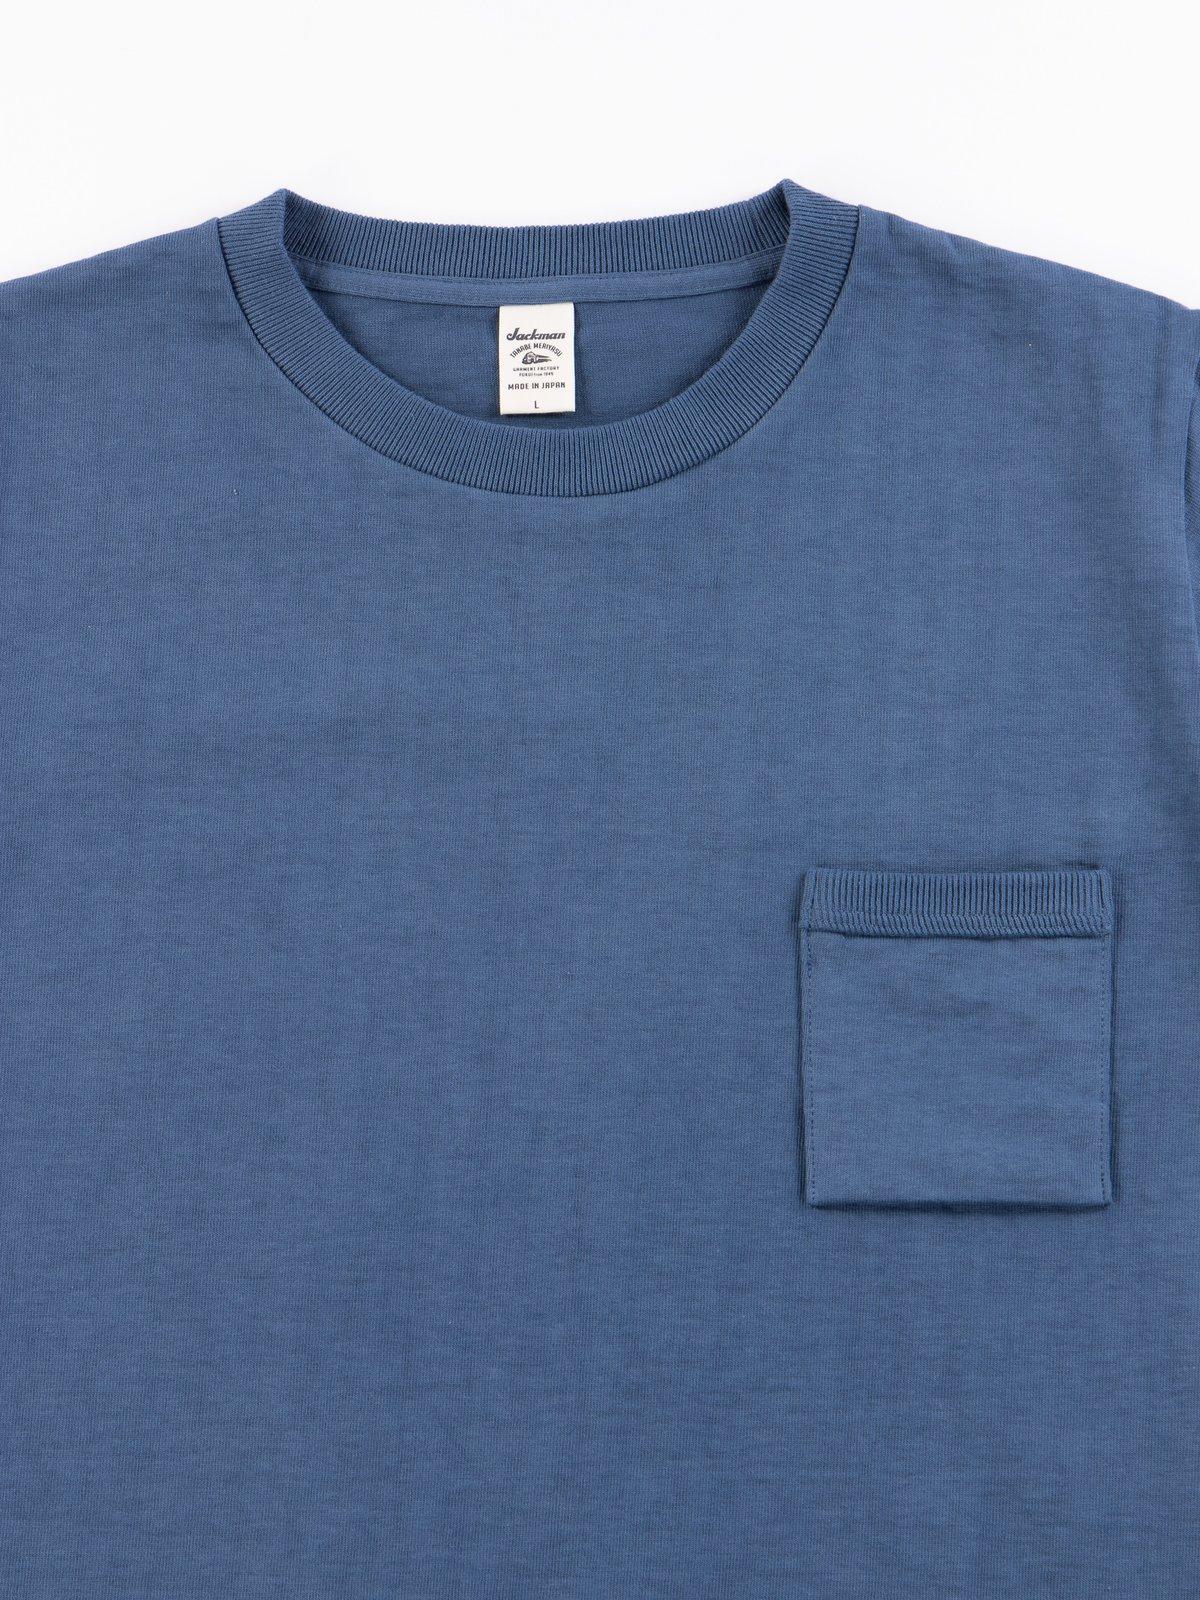 Ash Blue Dotsume Pocket T–Shirt - Image 3